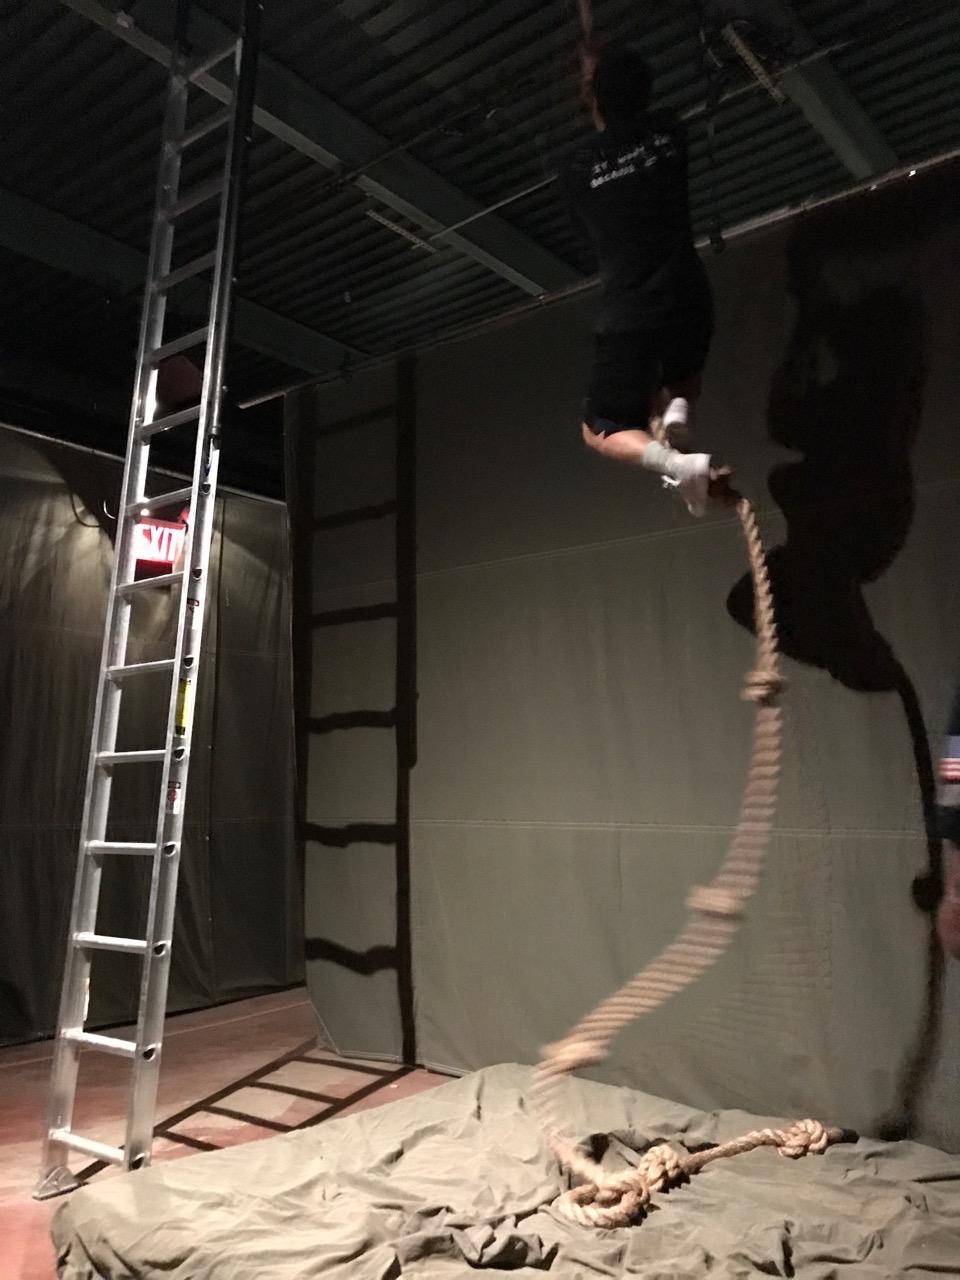 Tom Sachs Nike Nikecraft space camp AM - 1